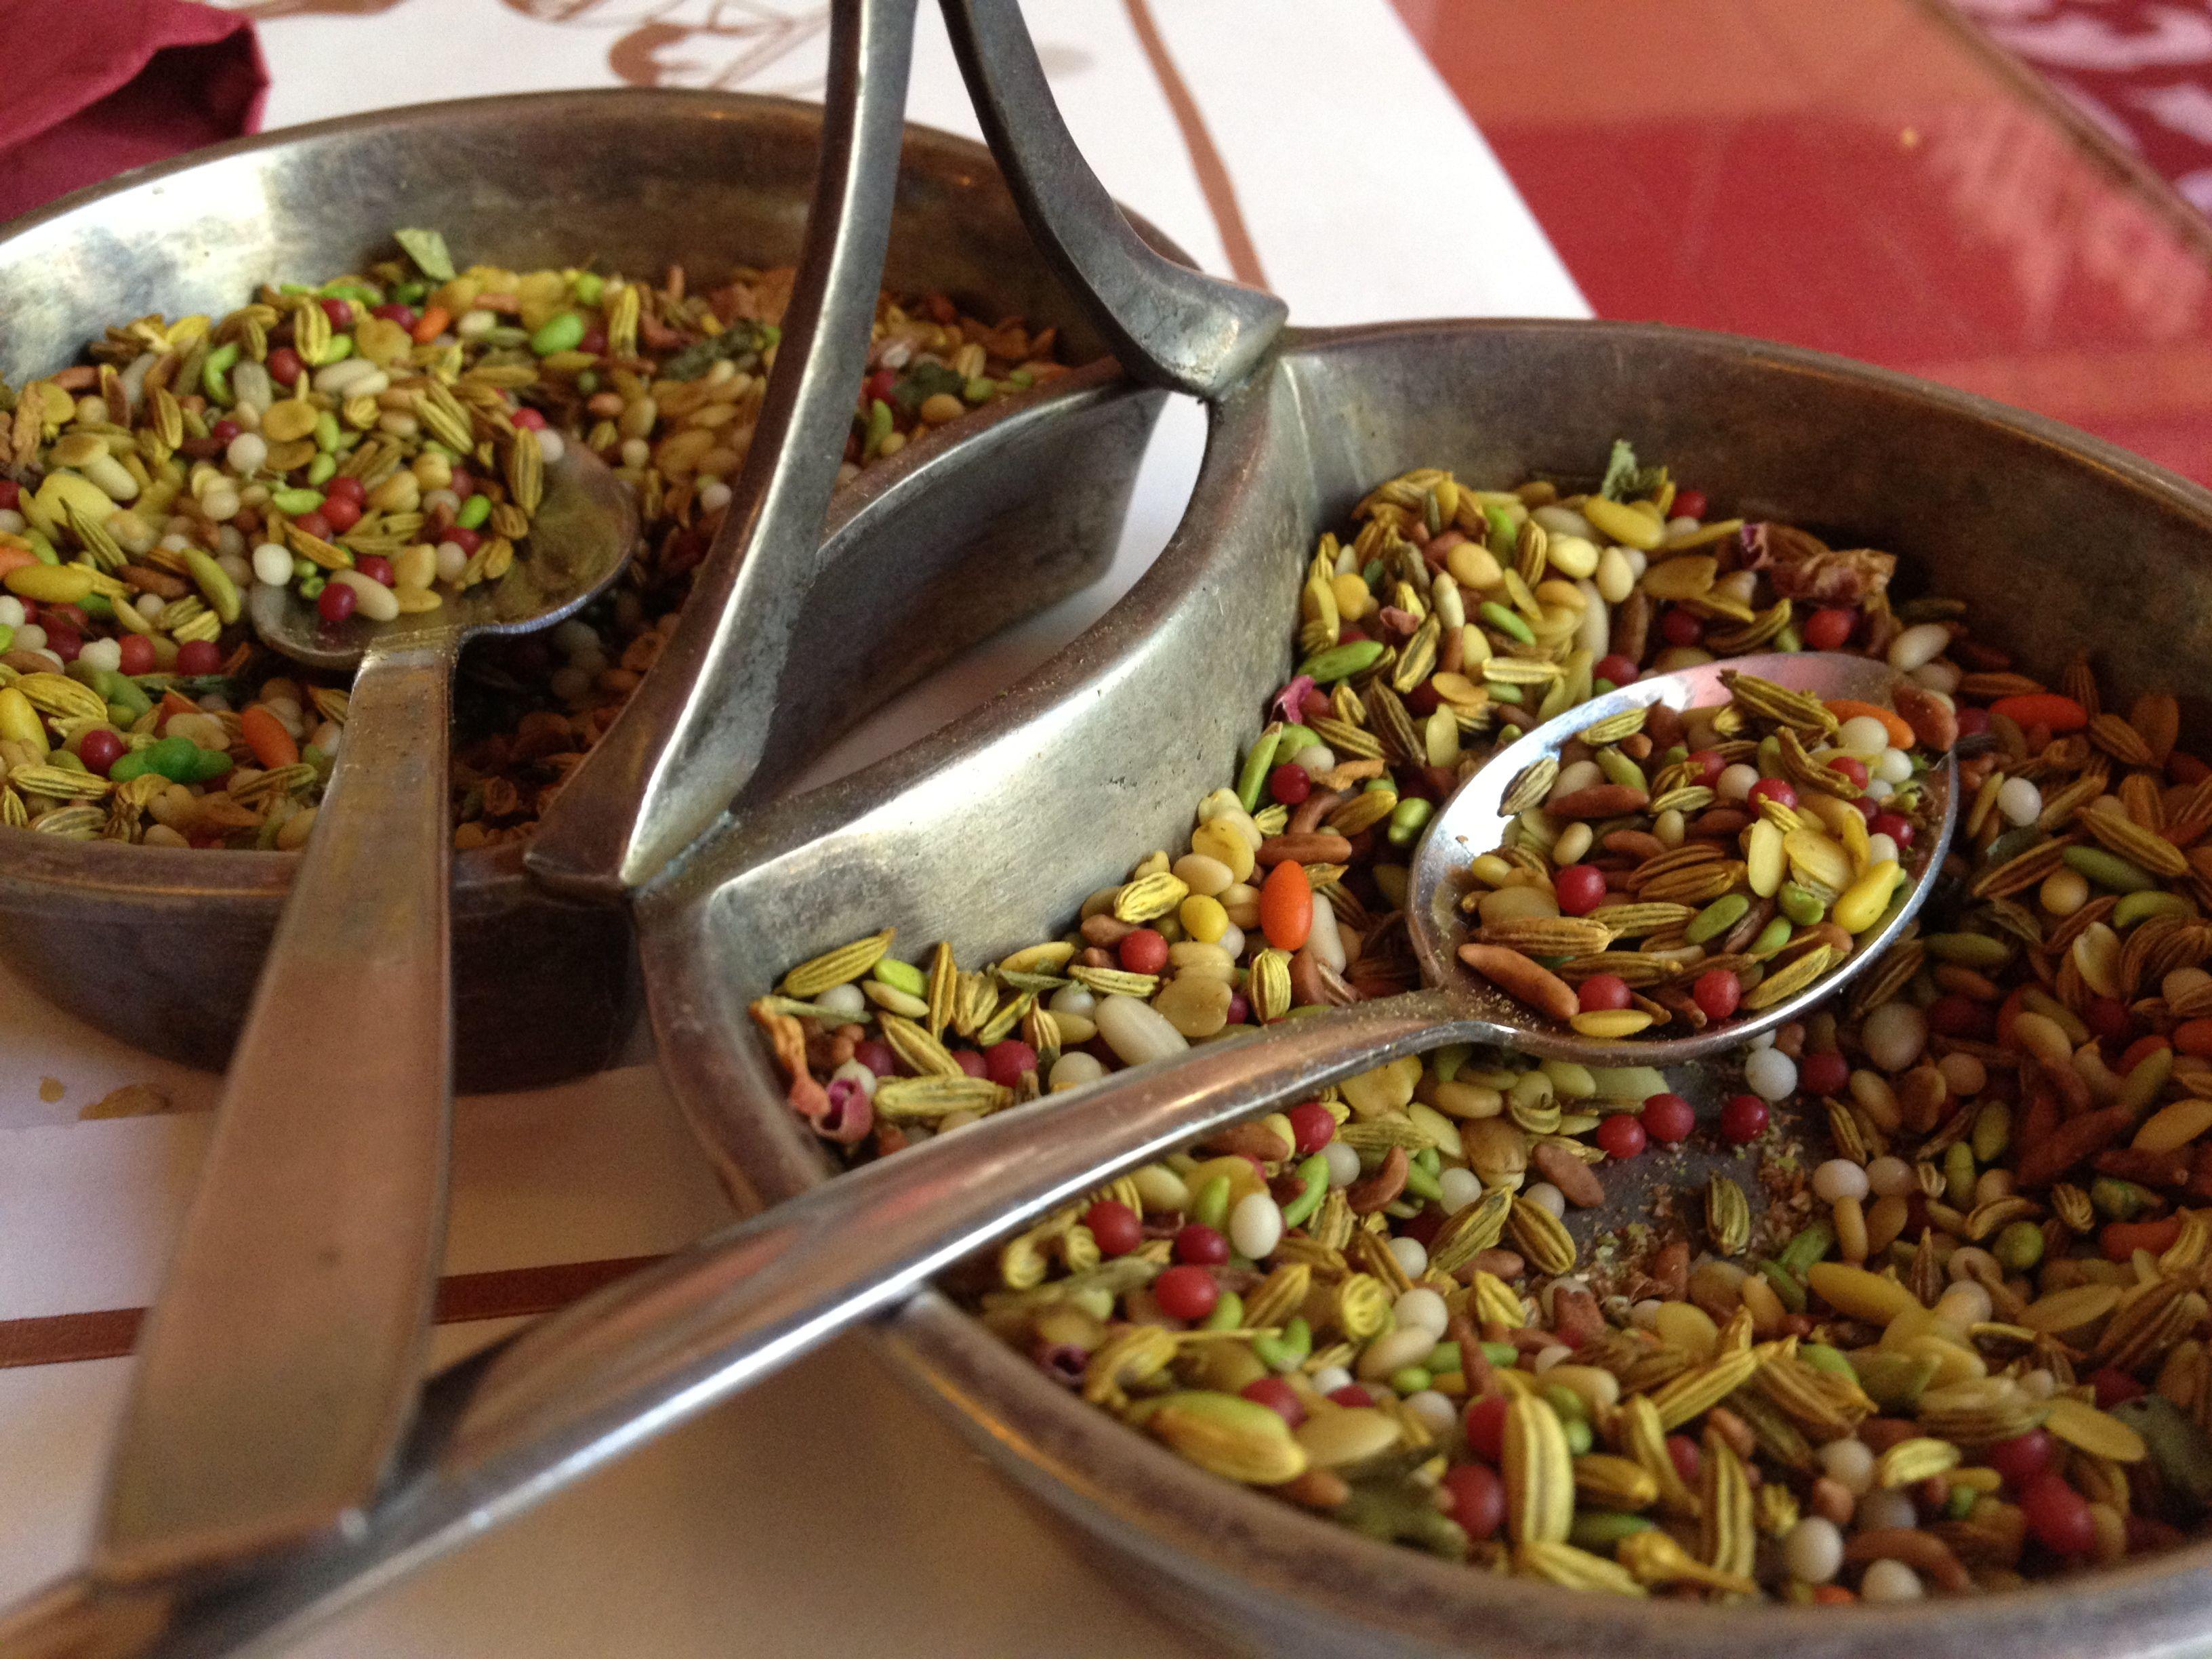 Indian mouth freshner dil pasand indian mouth freshner wedding anniversarytasty food forumfinder Gallery